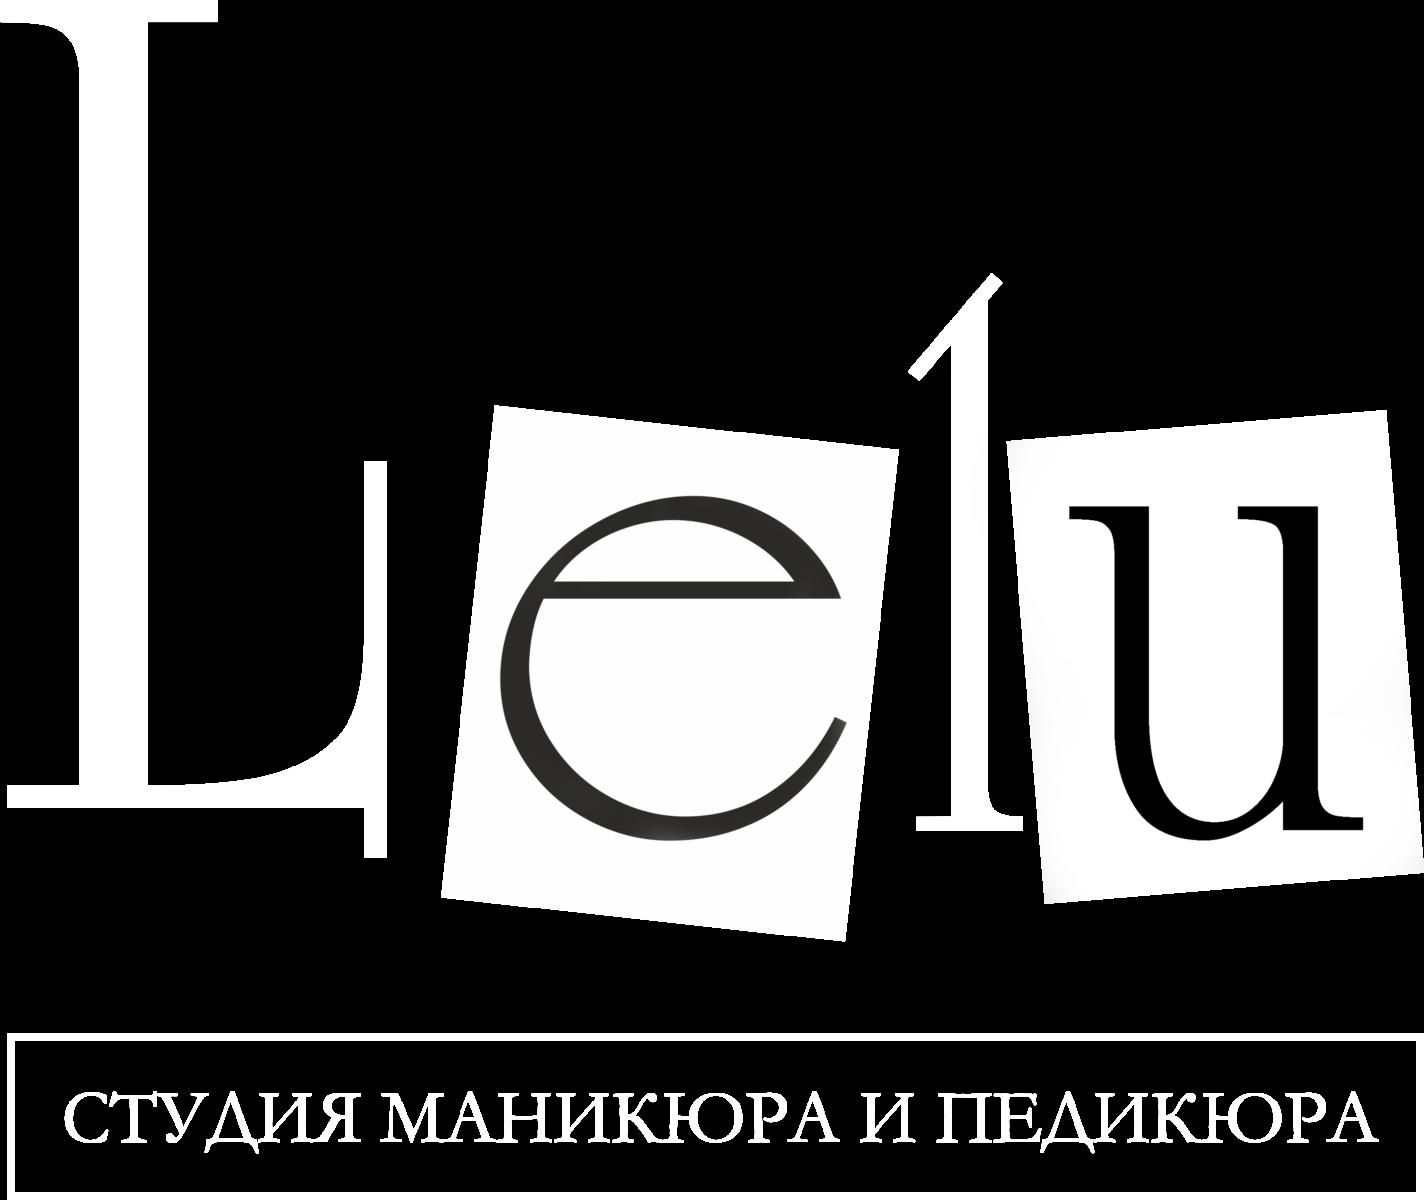 LeluStudio